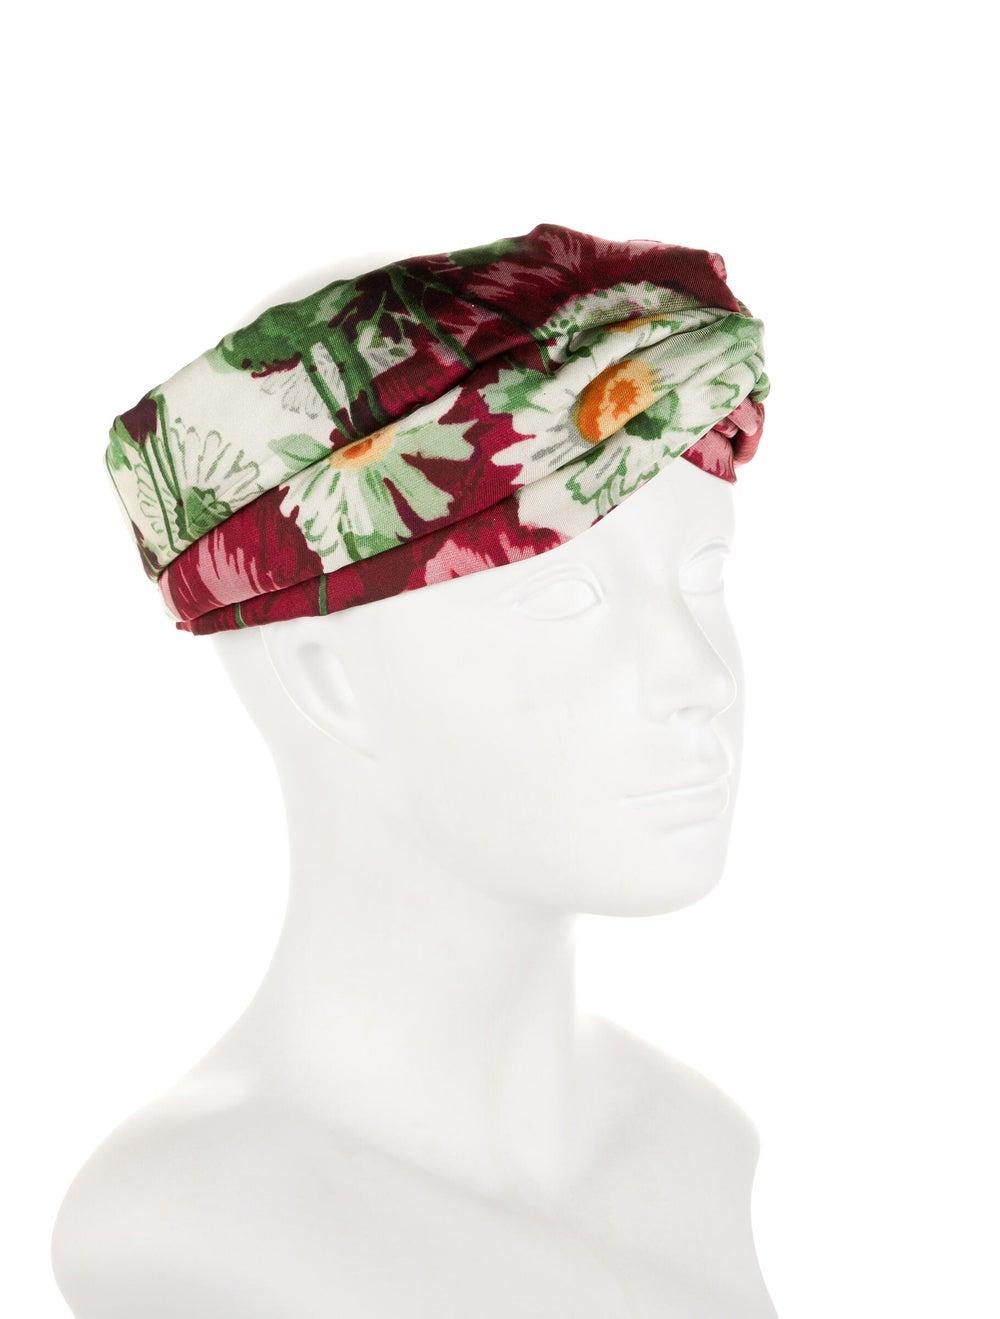 Gucci Silk Floral Headband multicolor - image 3